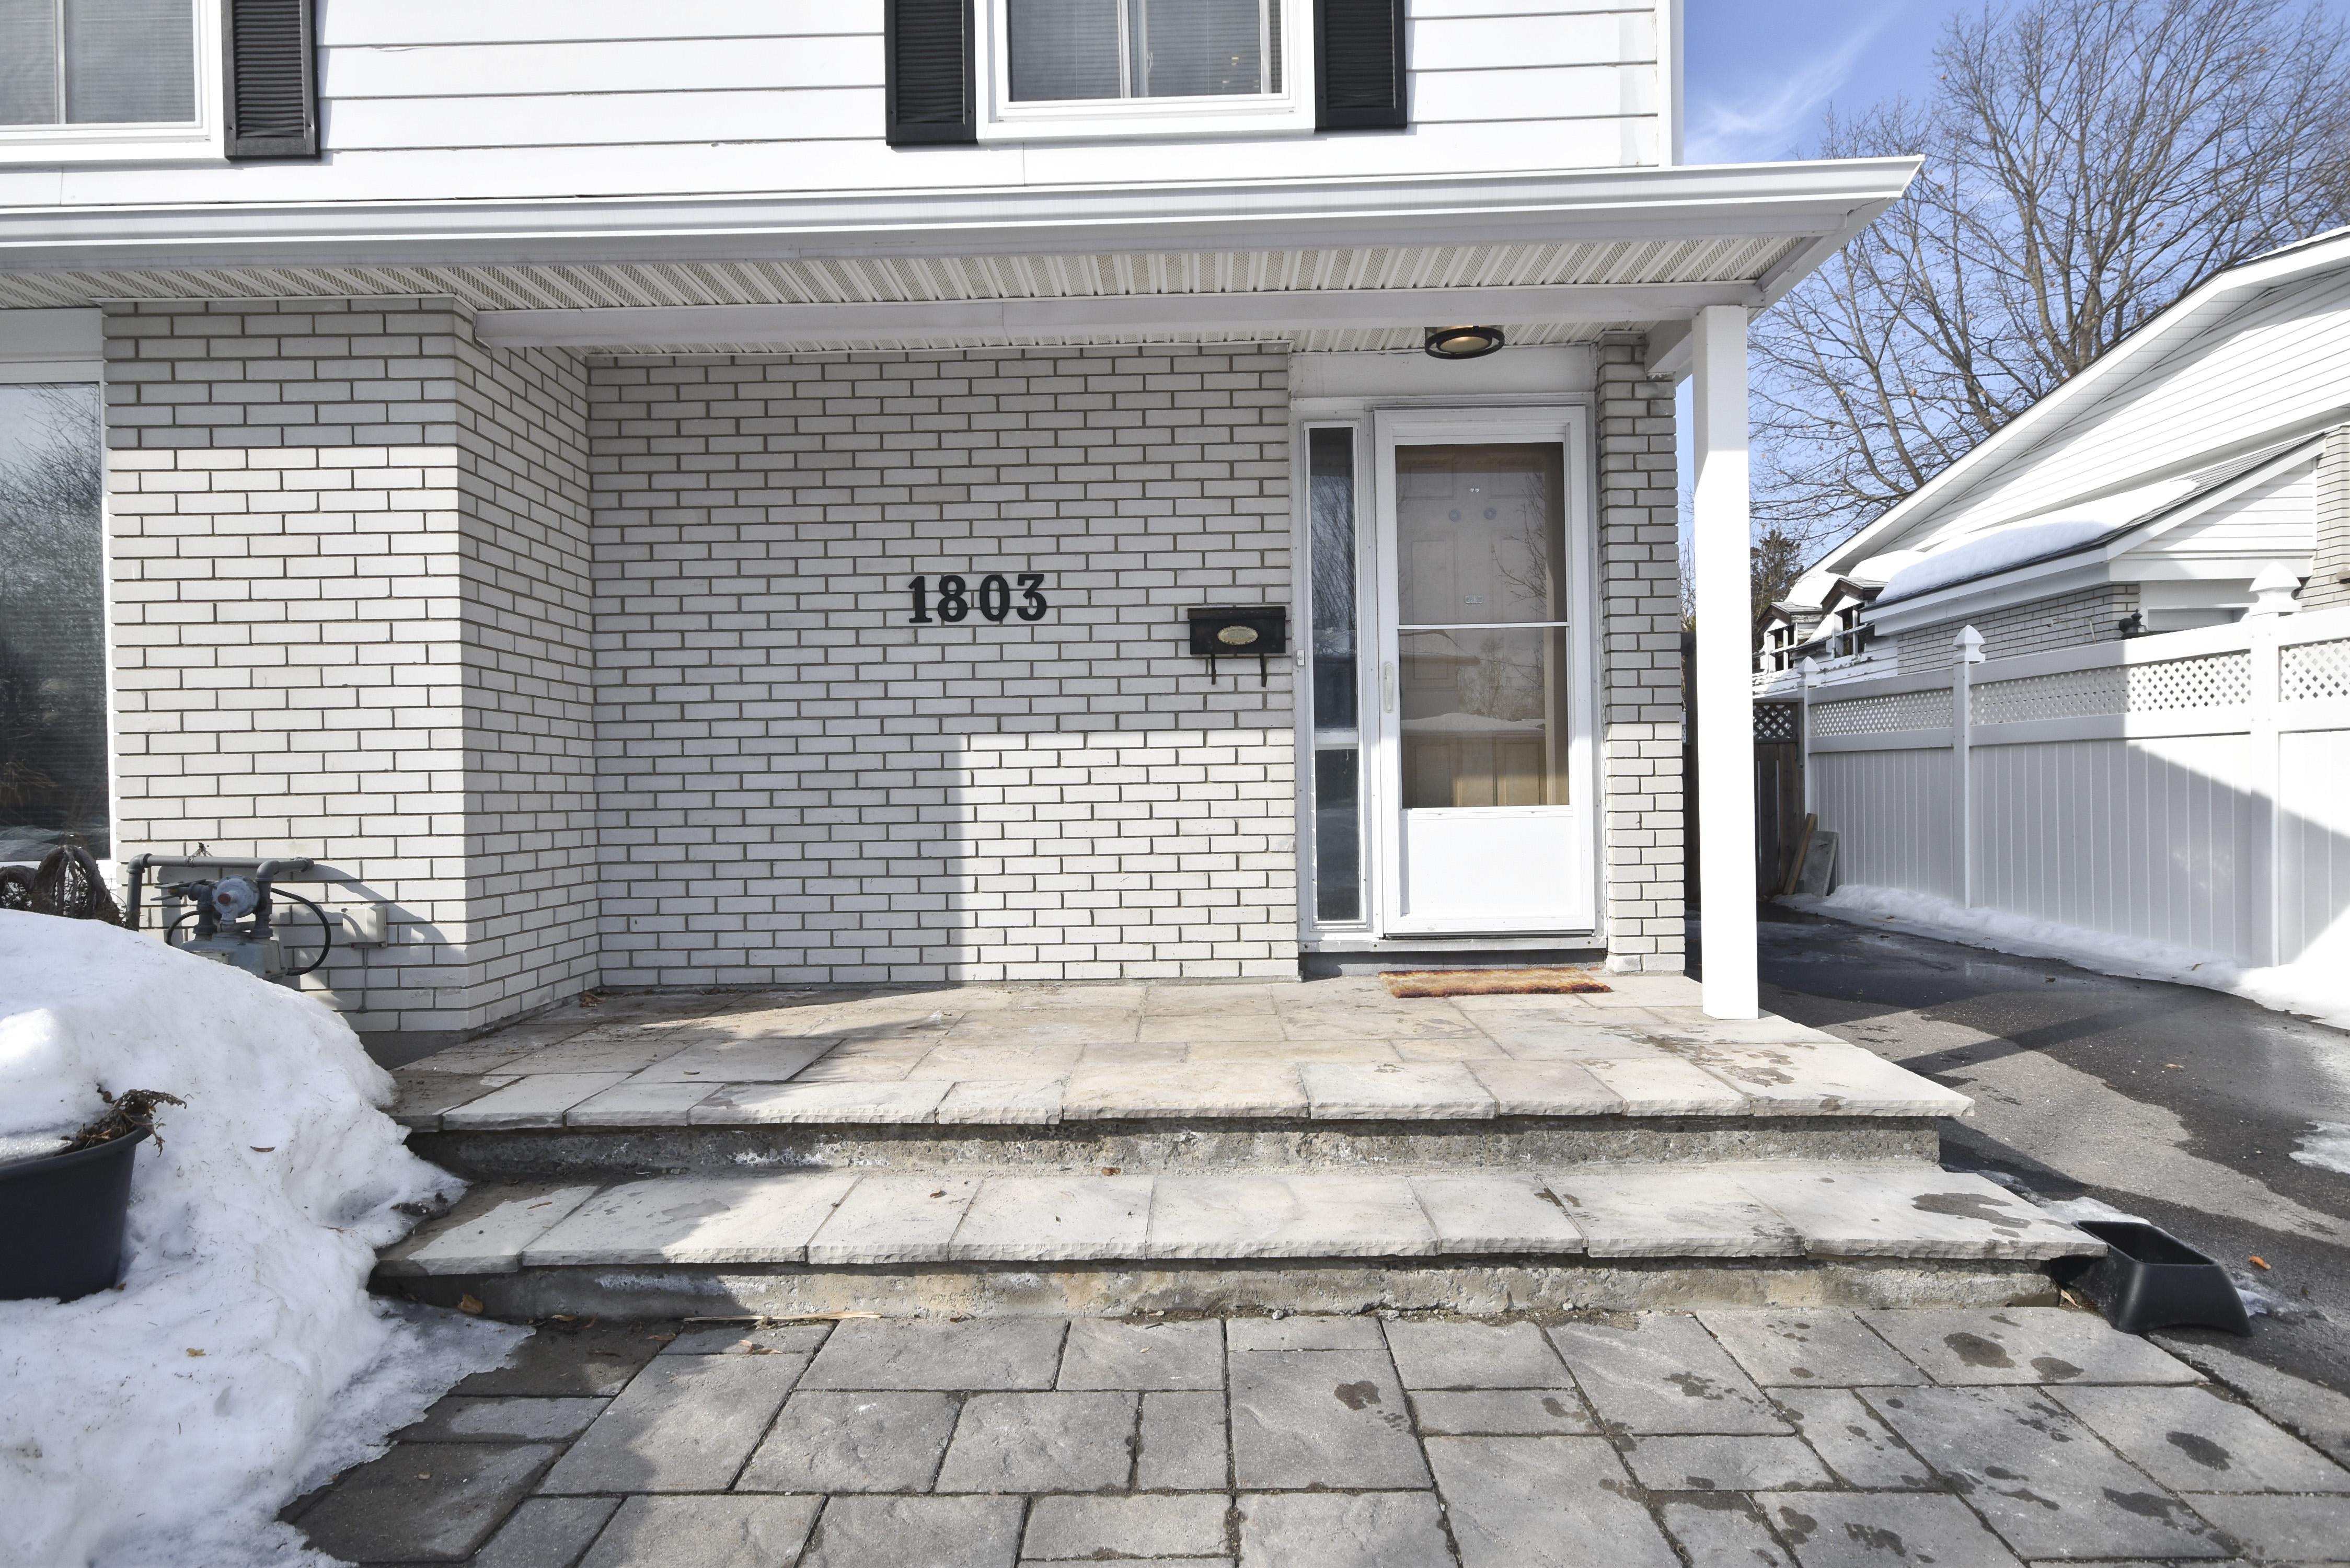 1803 Cloverlawn Cres, Ottawa, Ontario  K1J 6V6 - Photo 2 - RP2234913375